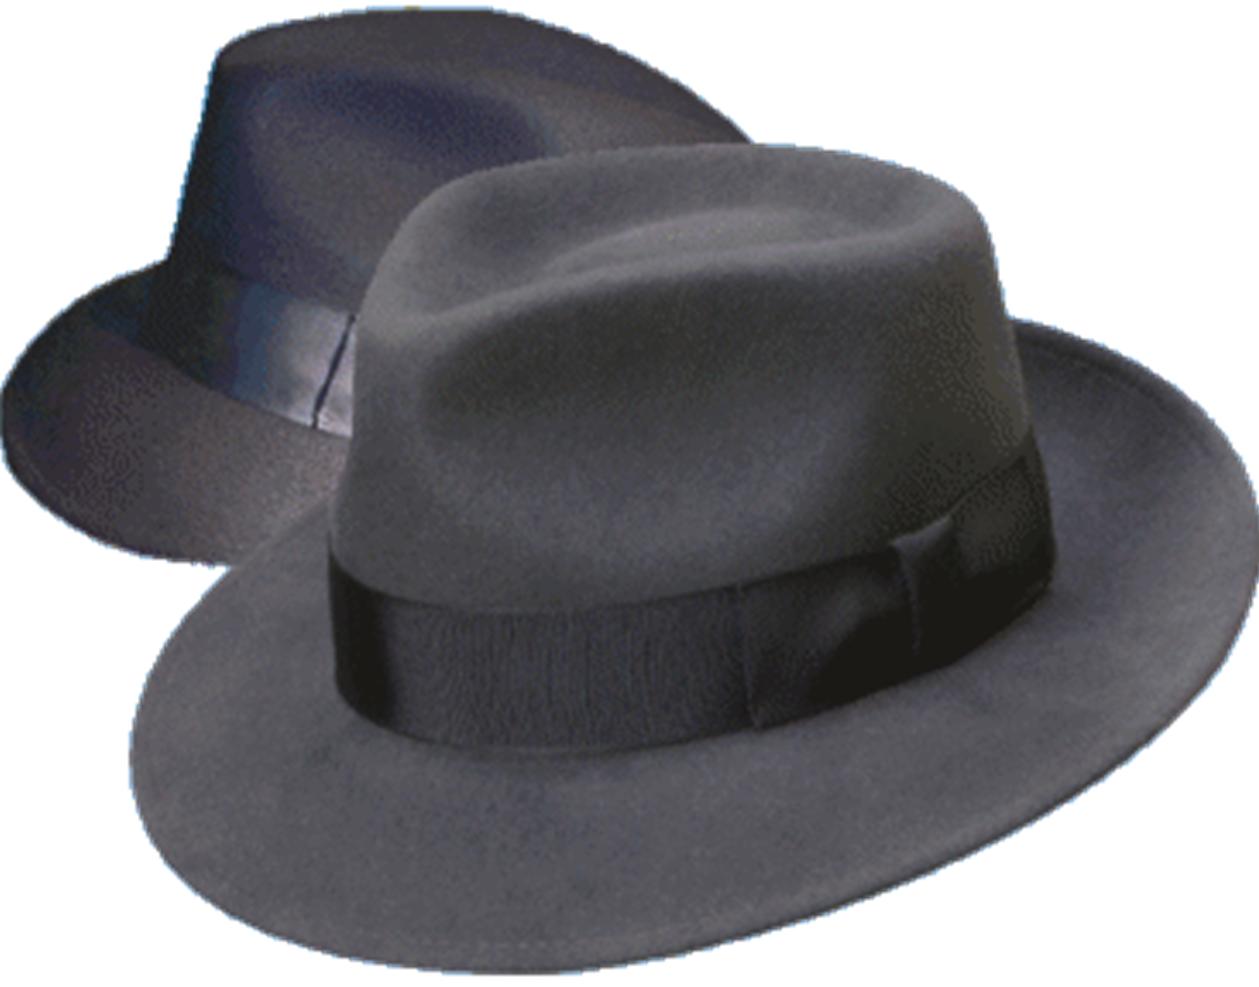 Hat for Vagabond